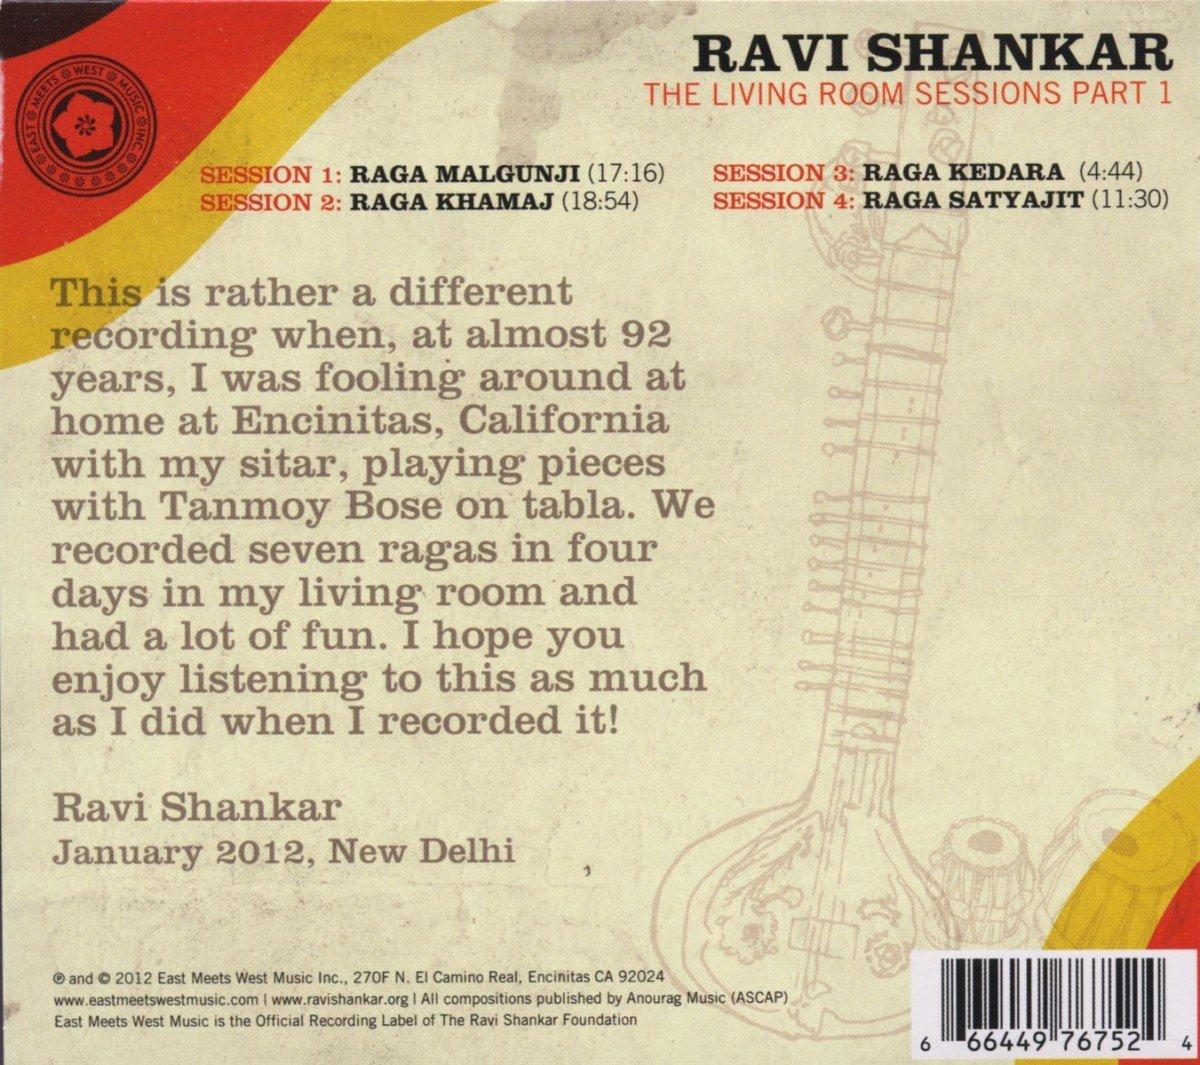 Ravi Shankar - Living Room Sessions - Part 1 - Amazon.com Music